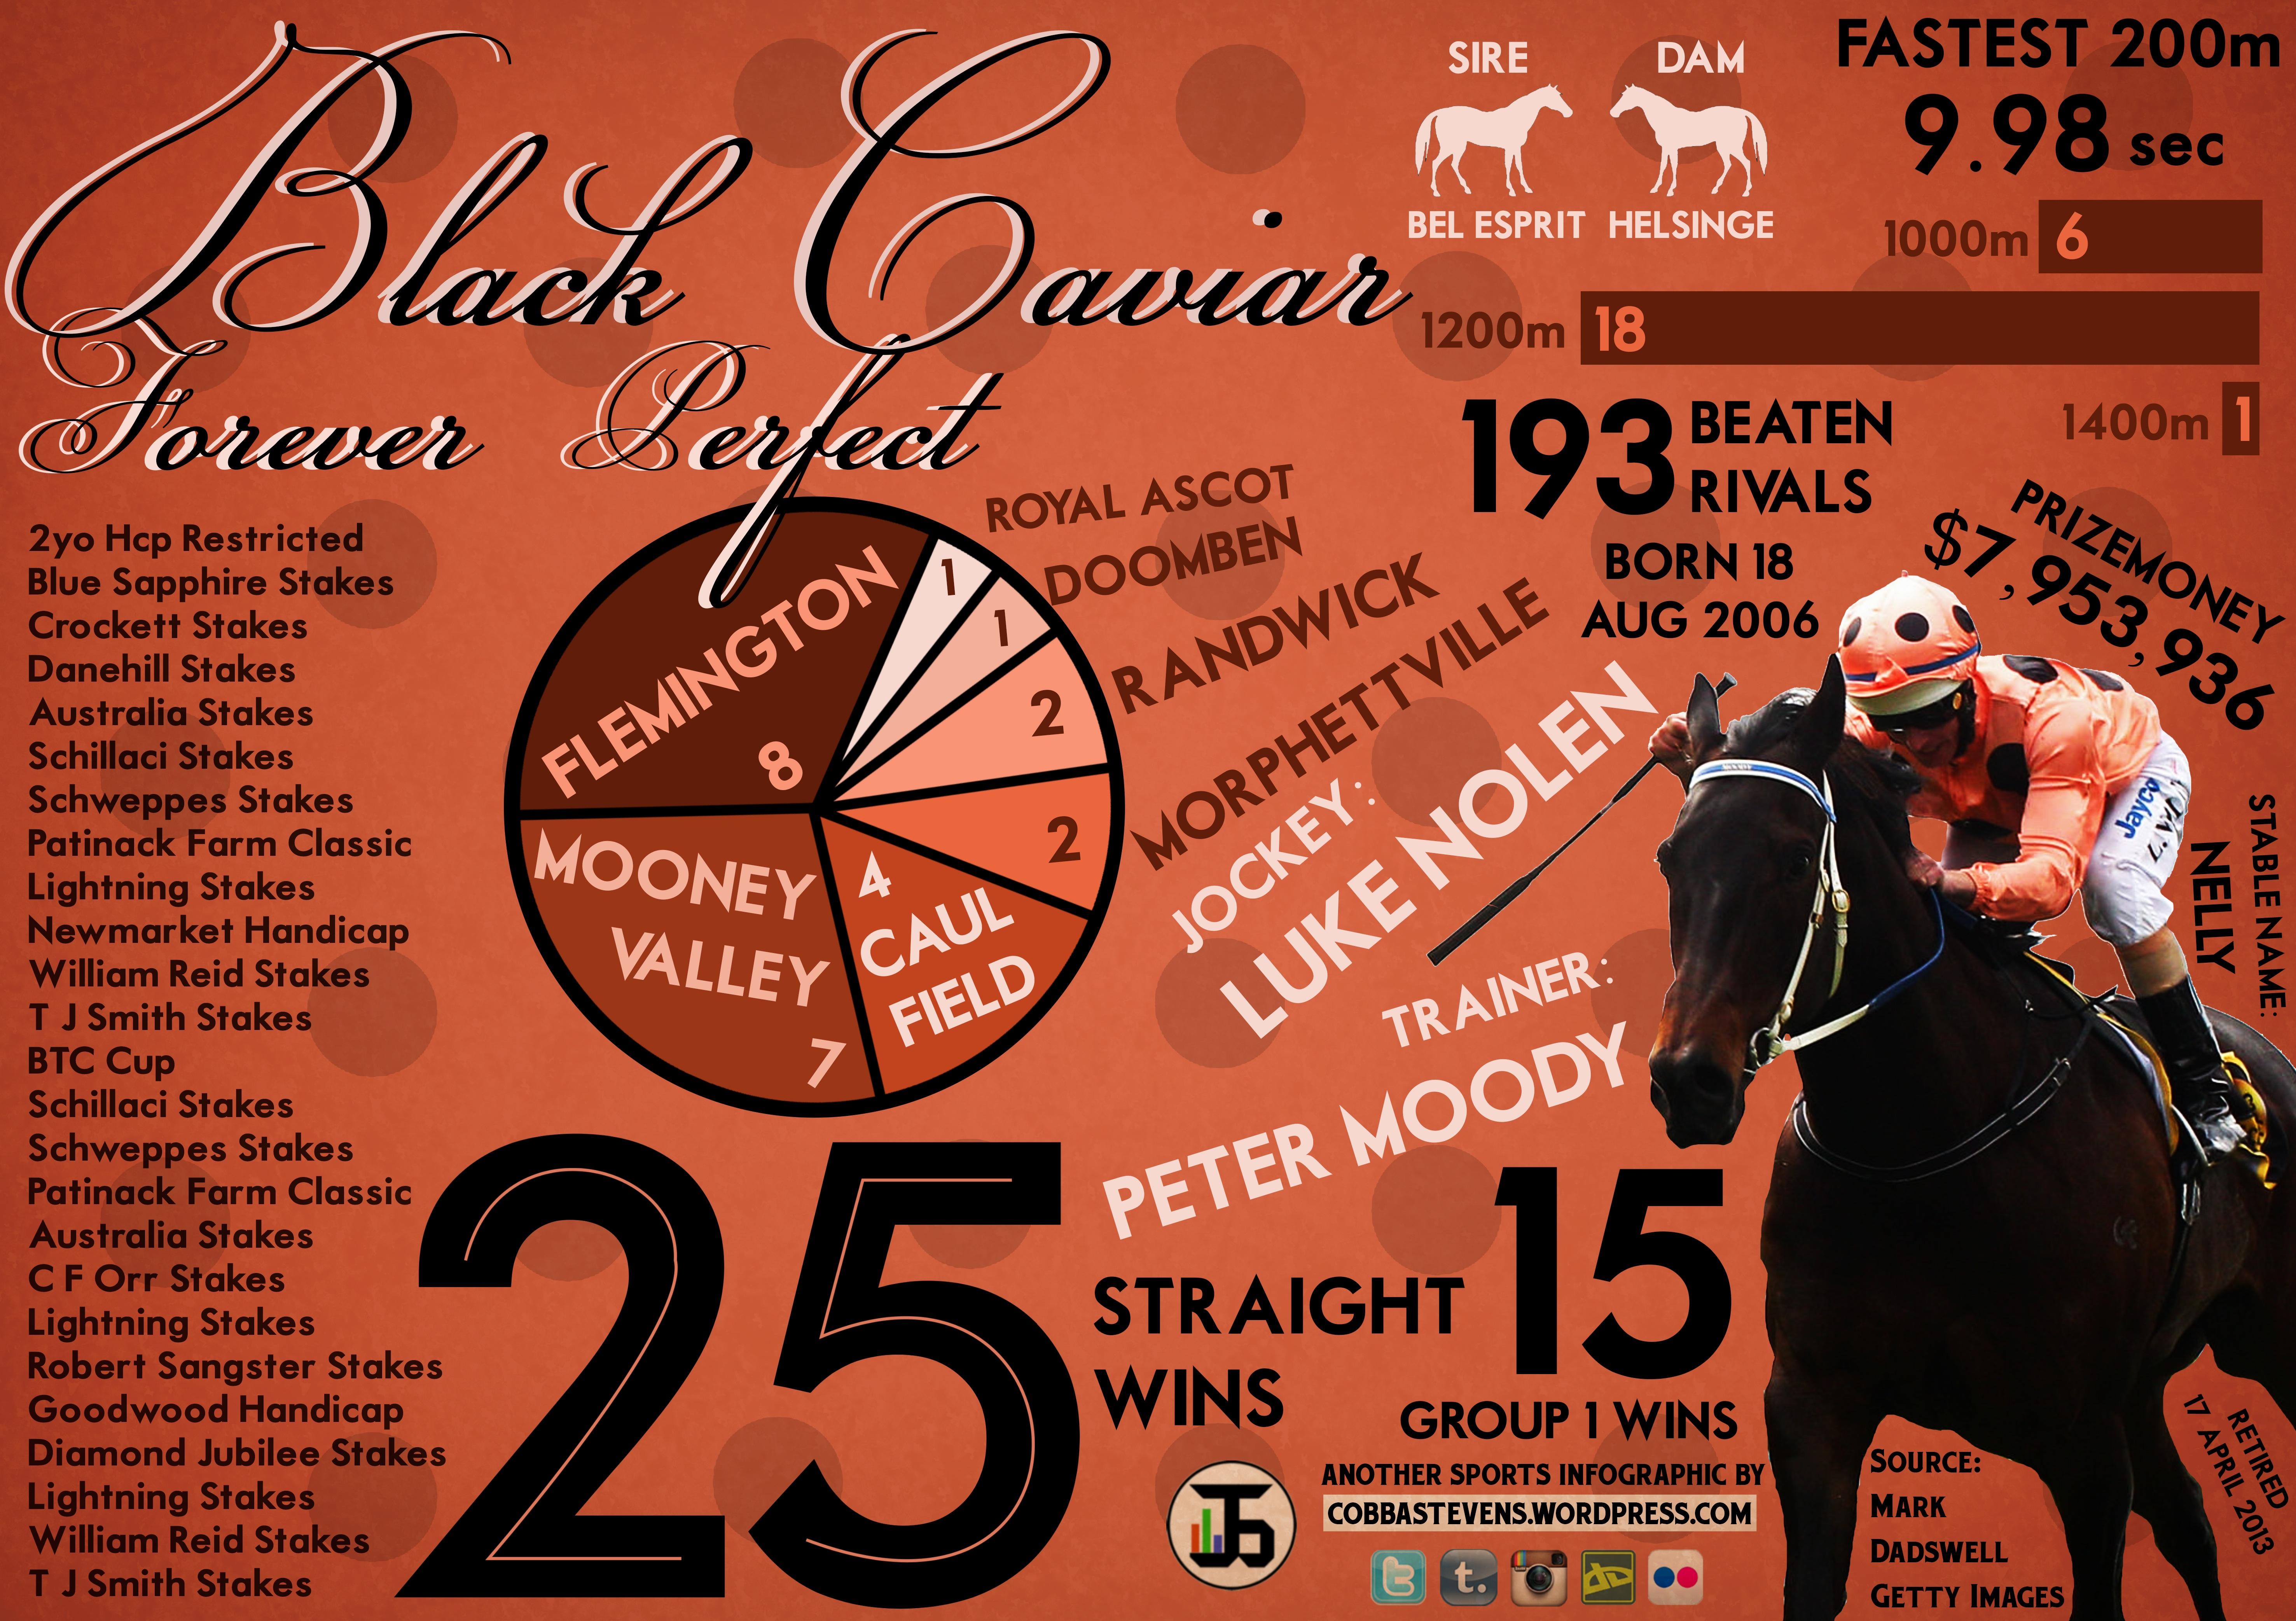 Black Caviar (2)